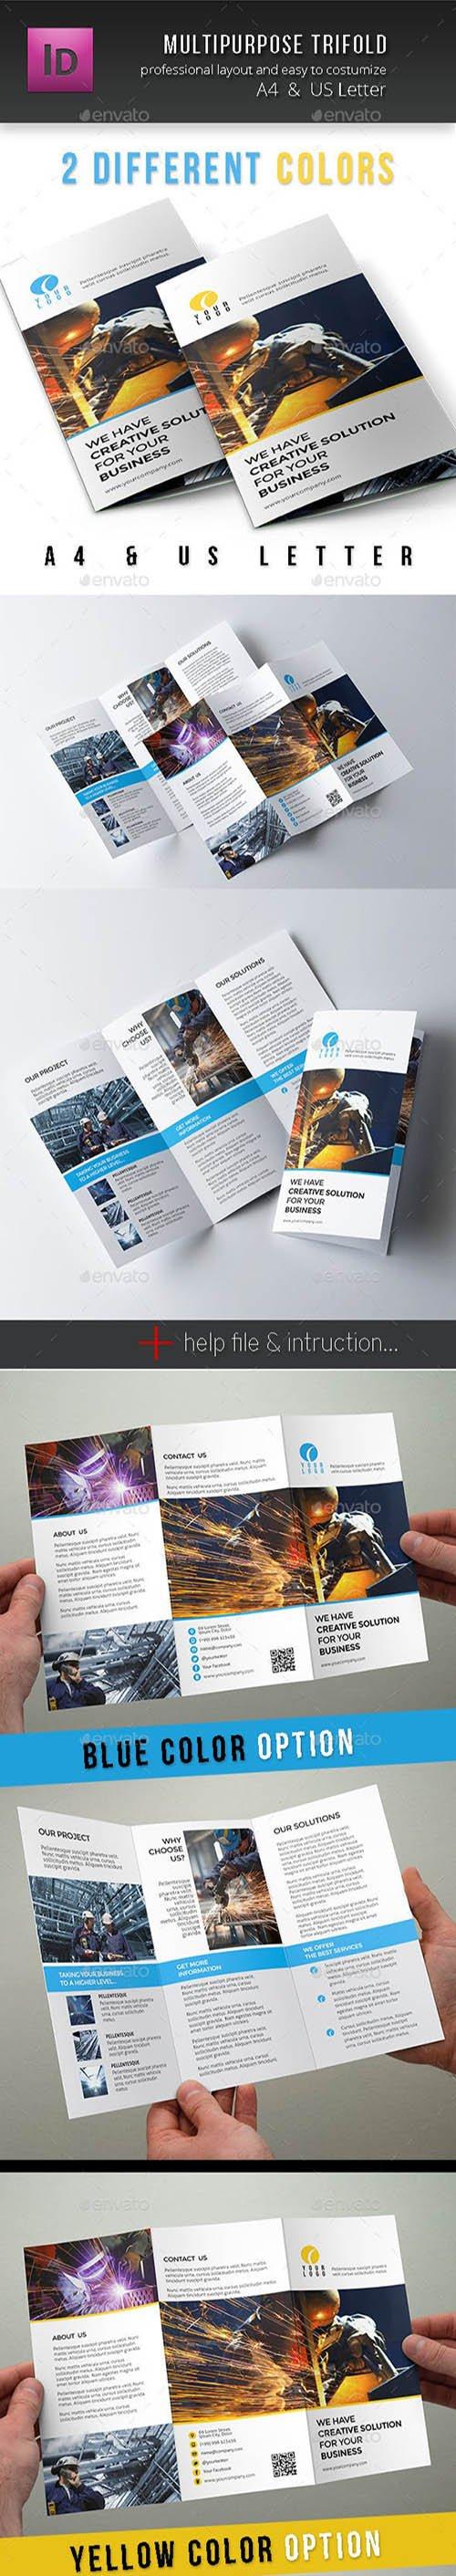 GR - Multipurpose Corporate Trifold 10787042